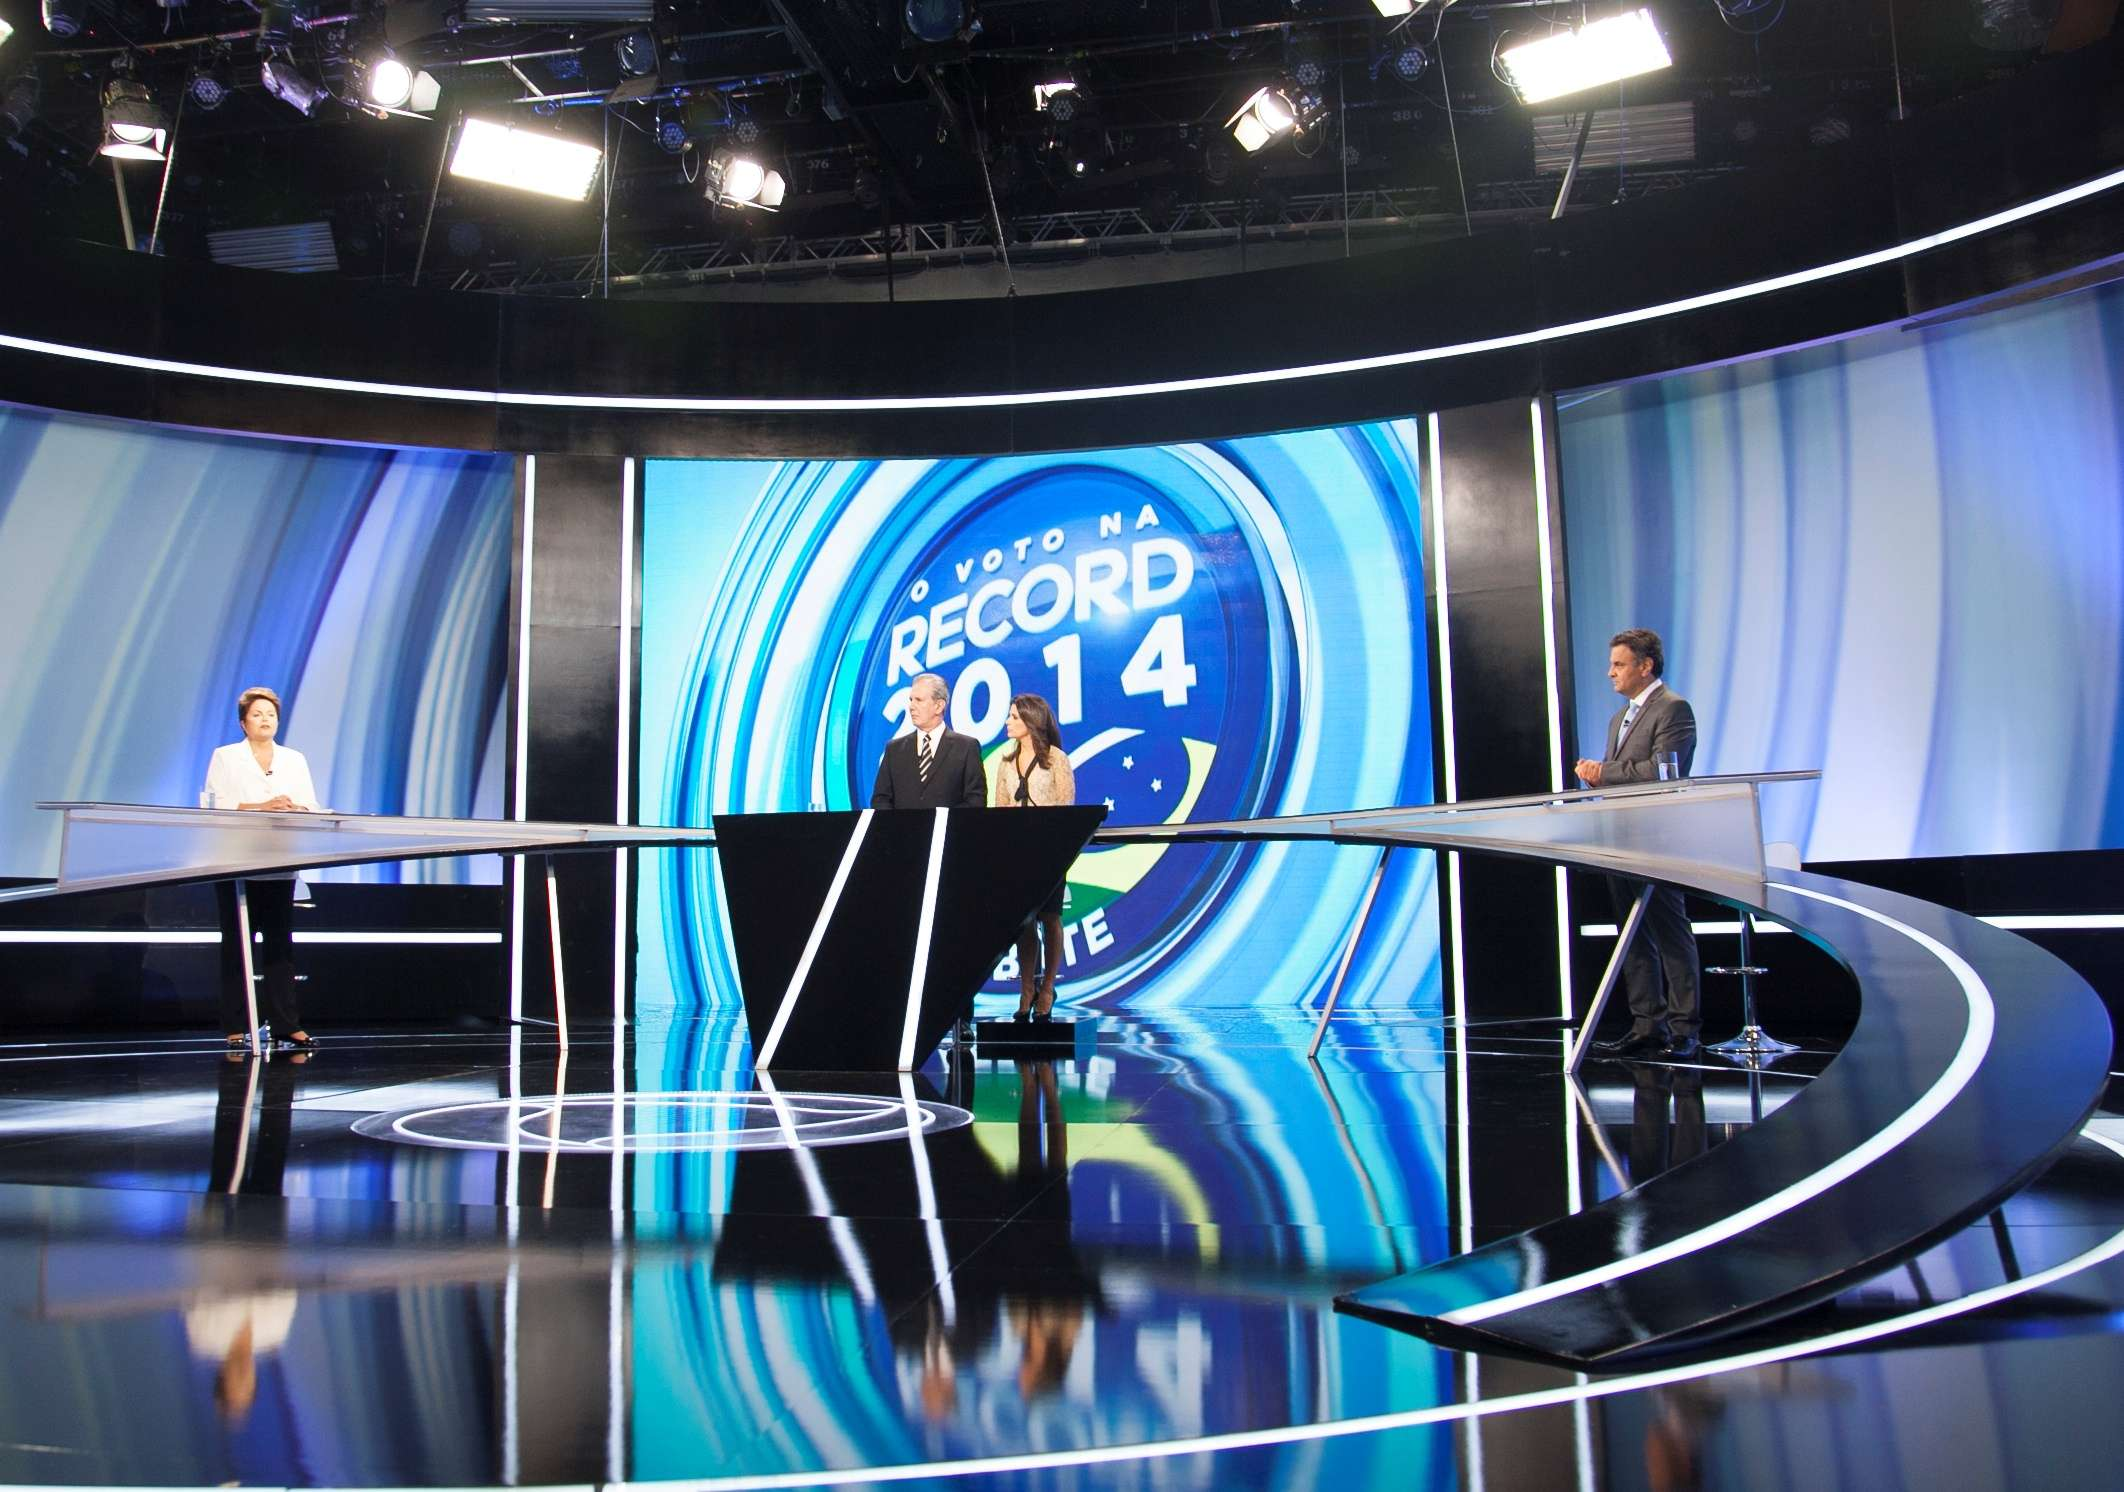 Dilma e Aécio fizeram debate menos agressivo na TV Record Foto: Edu Moraes/TV Record